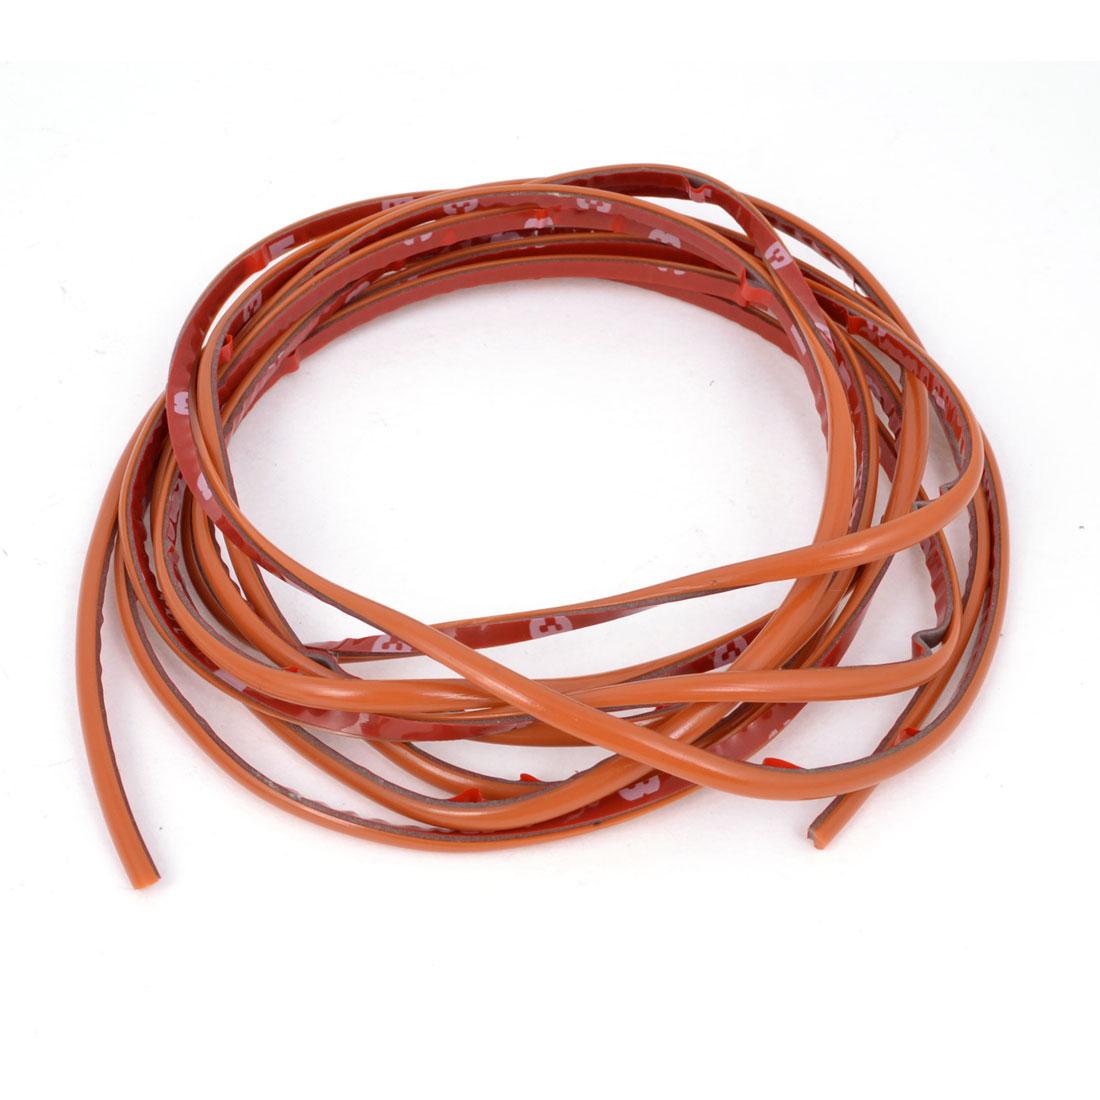 "Orange Soft Plastic 4mm Width 118"" Long Flexible Car Trim Strip"